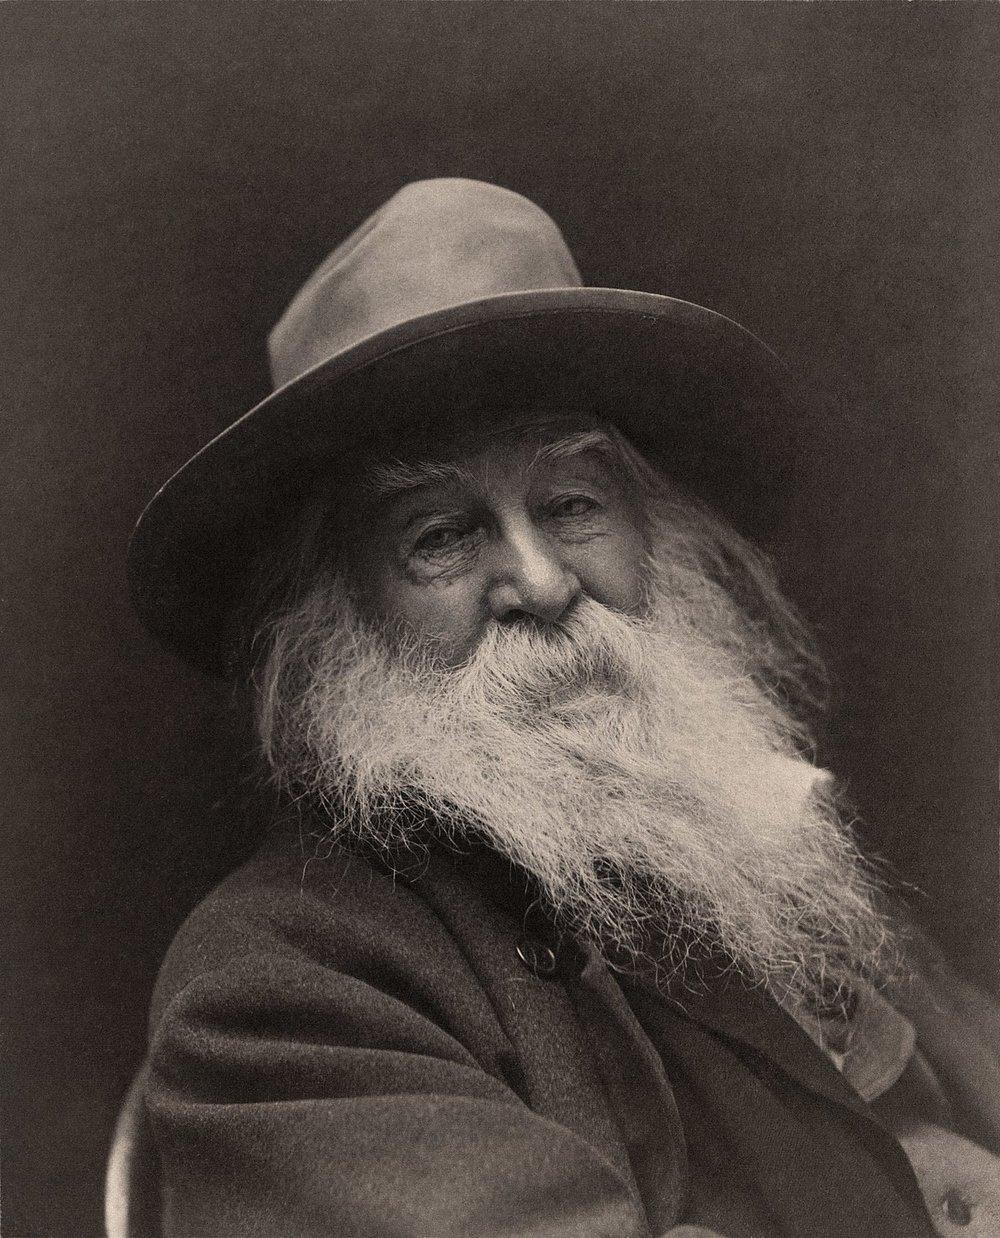 Walt Whitman fotografiado en 1887 por George C. Cox